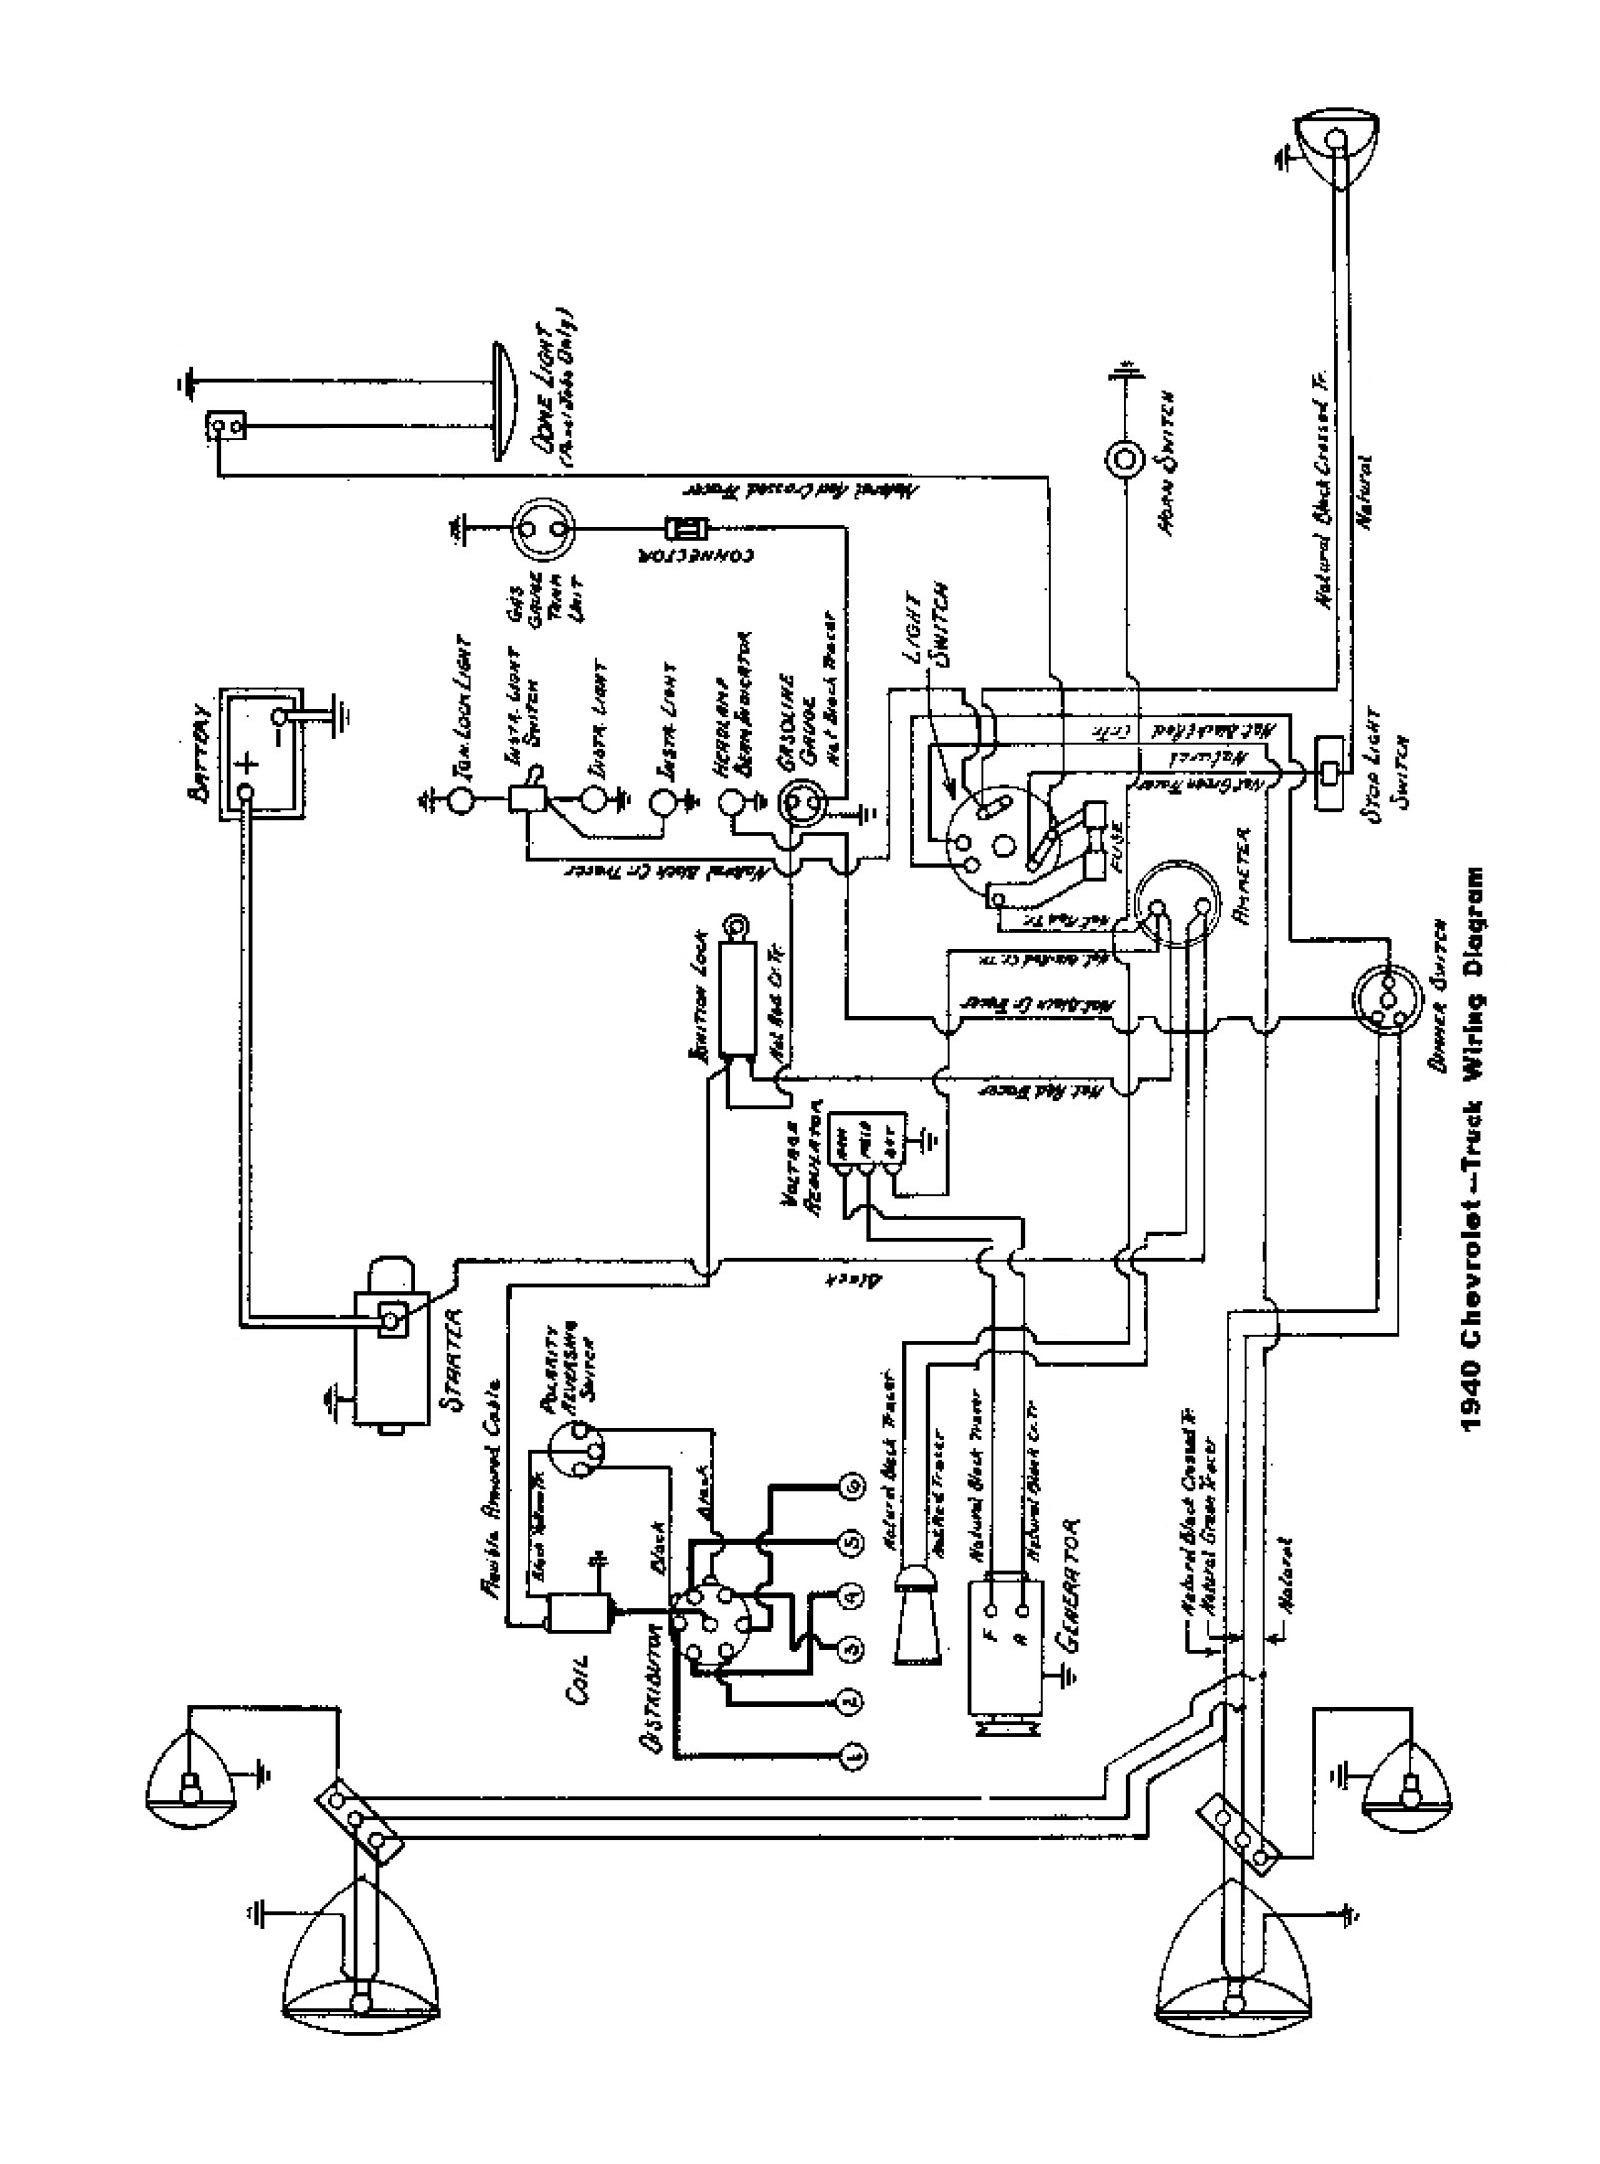 1957 Chevrolet Truck Wiring Diagram Electrical Schematics 79 Chevy Starter Get Free Image About 1979 House U2022 Solenoid